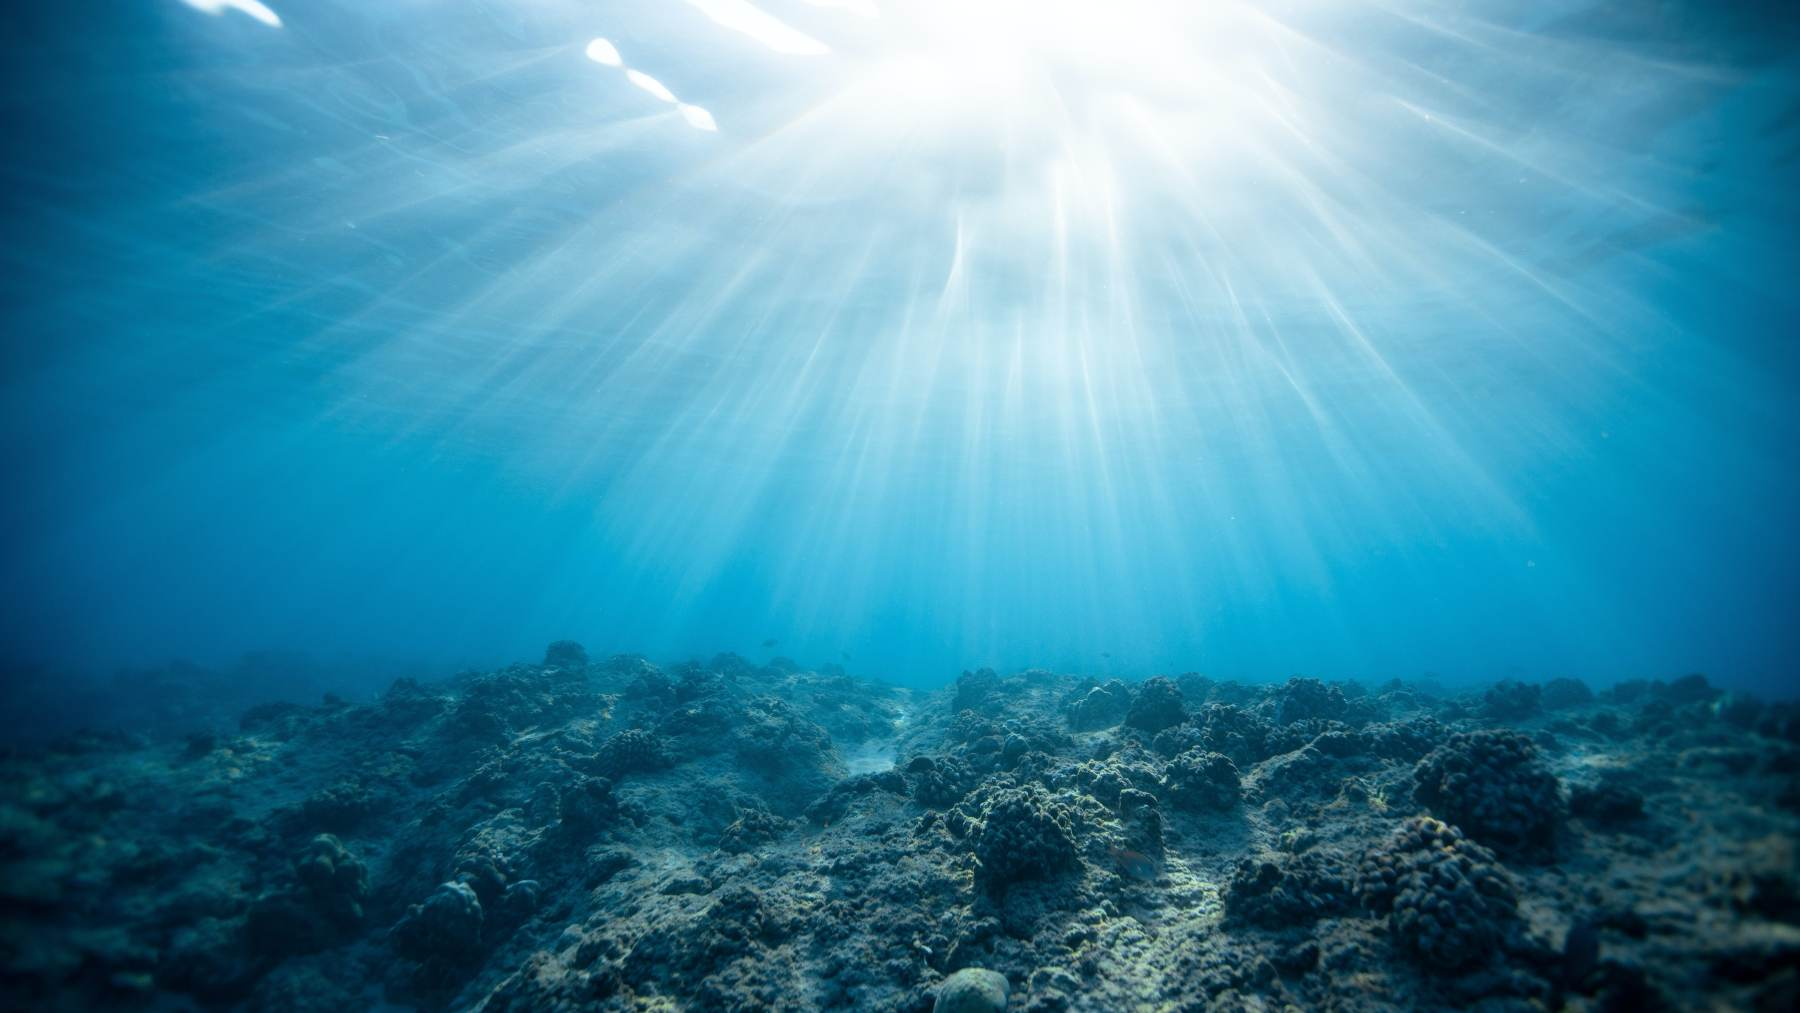 Peces de aguas profundas